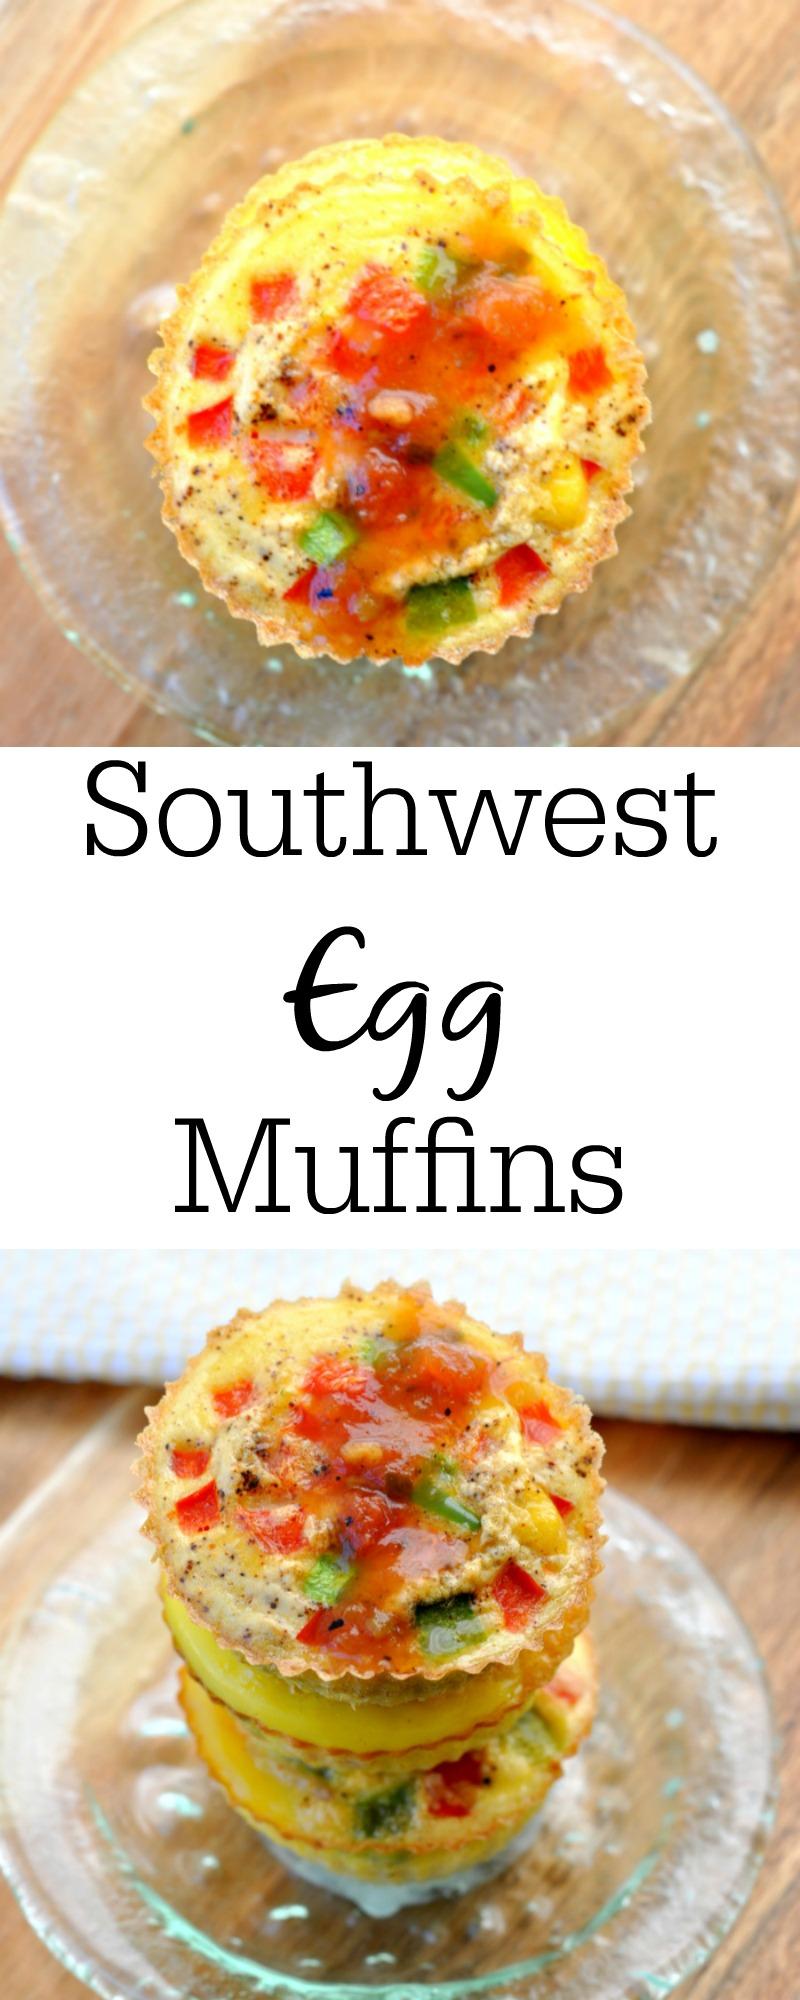 Southwestern Egg Muffins